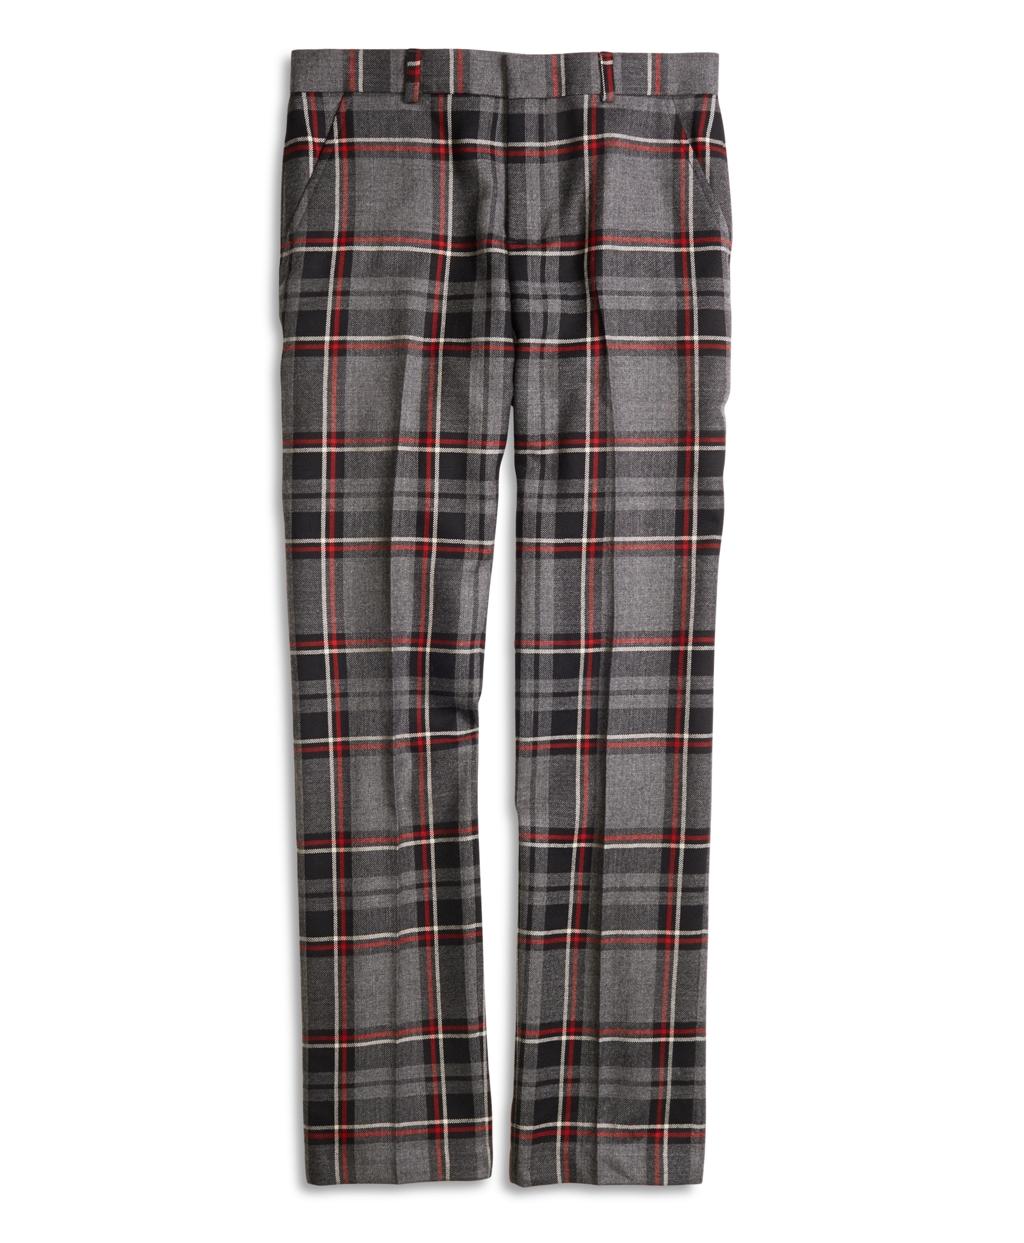 pants-vape-nation-cosplay